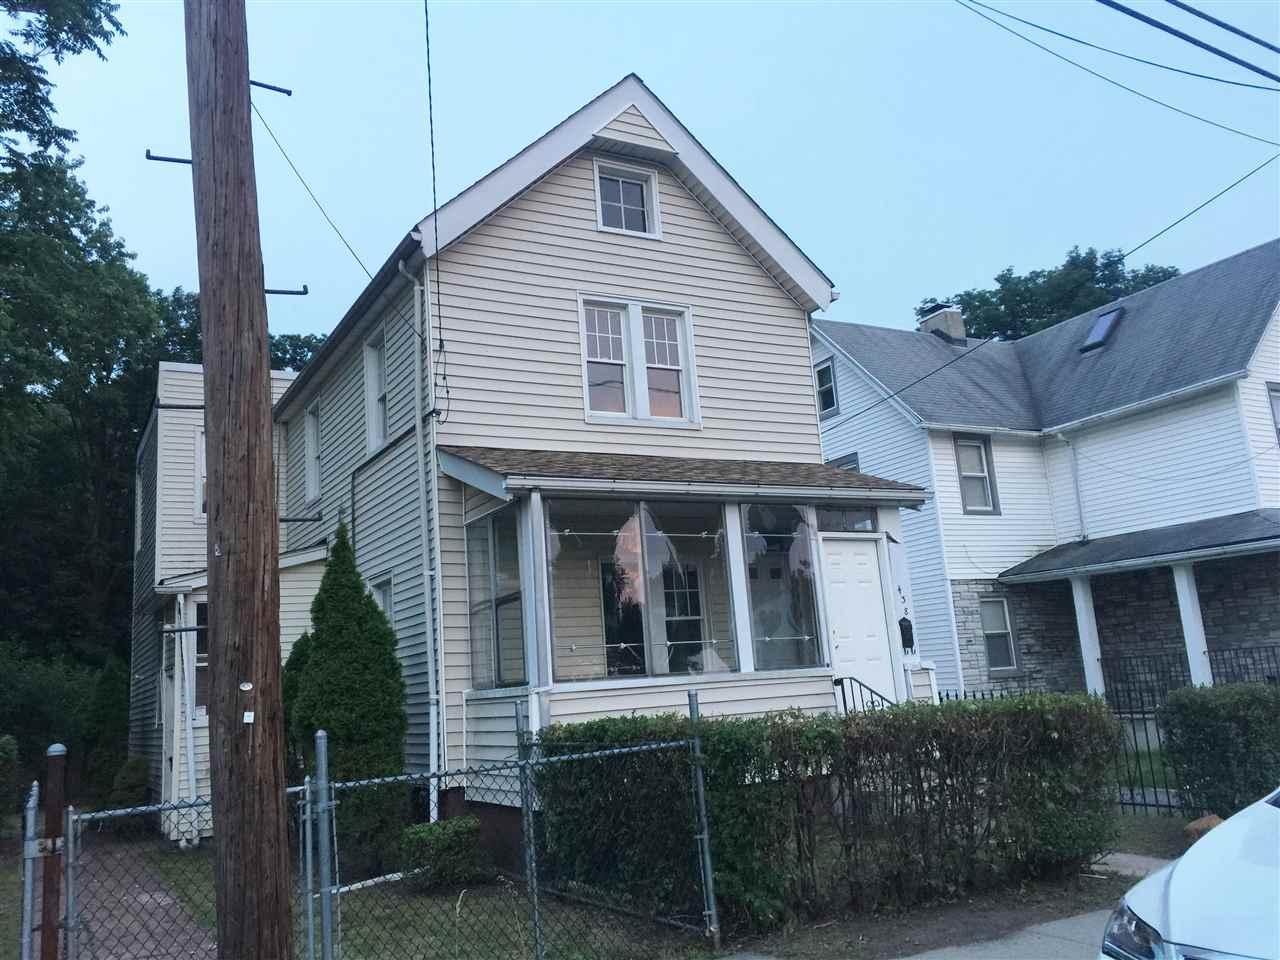 438 BURNSIDE ST, Orange, NJ 07050